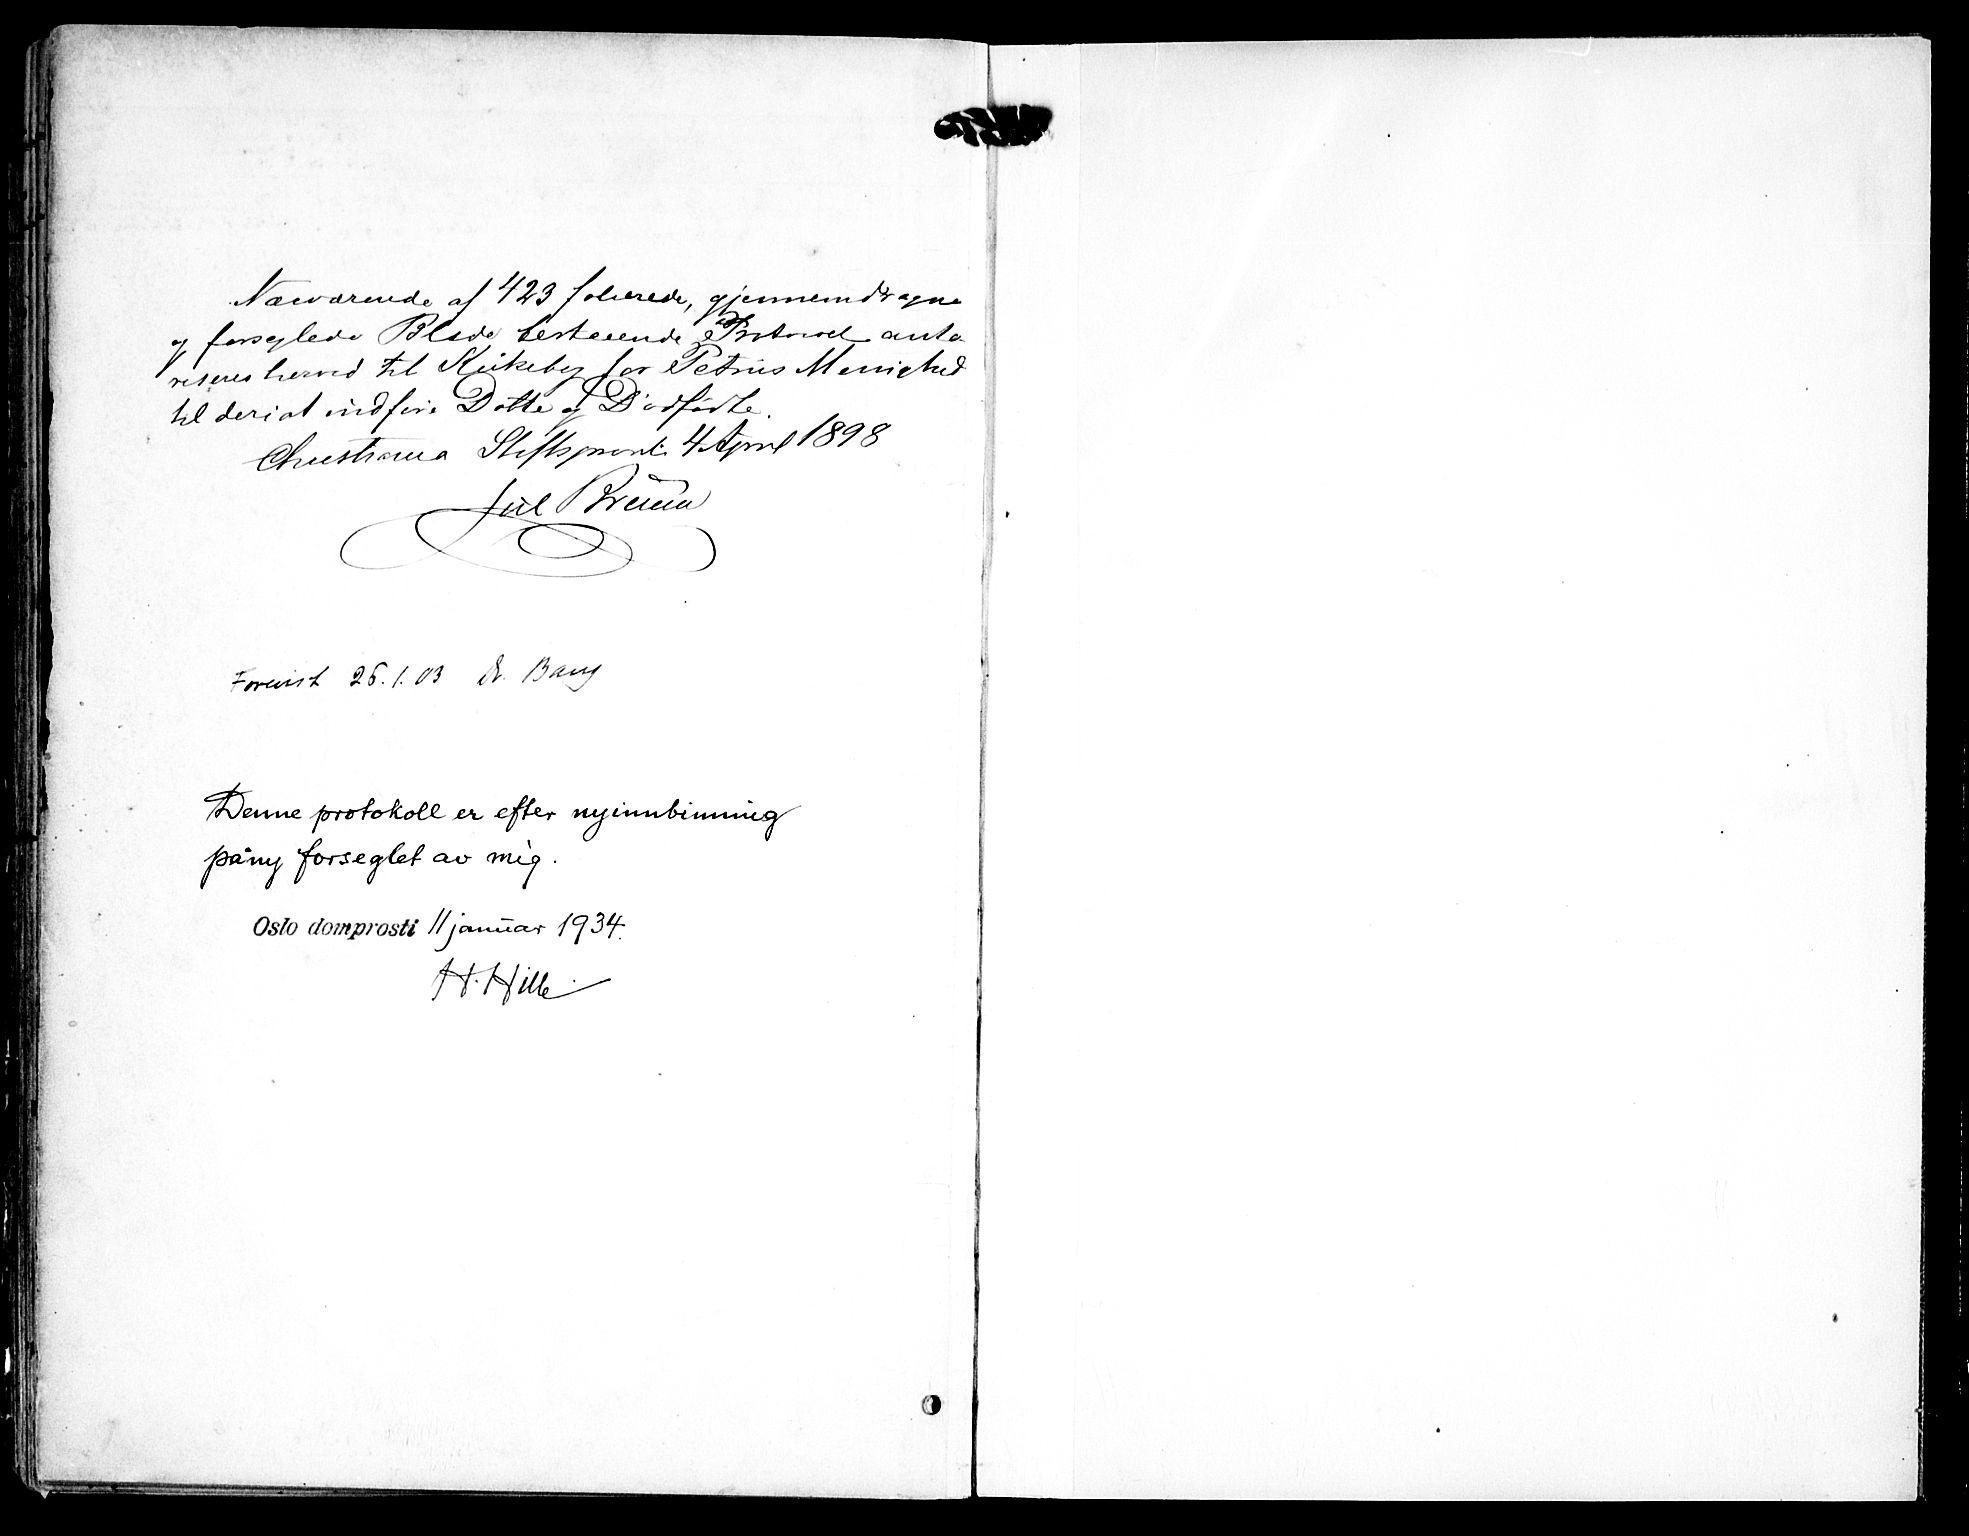 SAO, Petrus prestekontor Kirkebøker, F/Fa/L0008: Ministerialbok nr. 8, 1899-1909